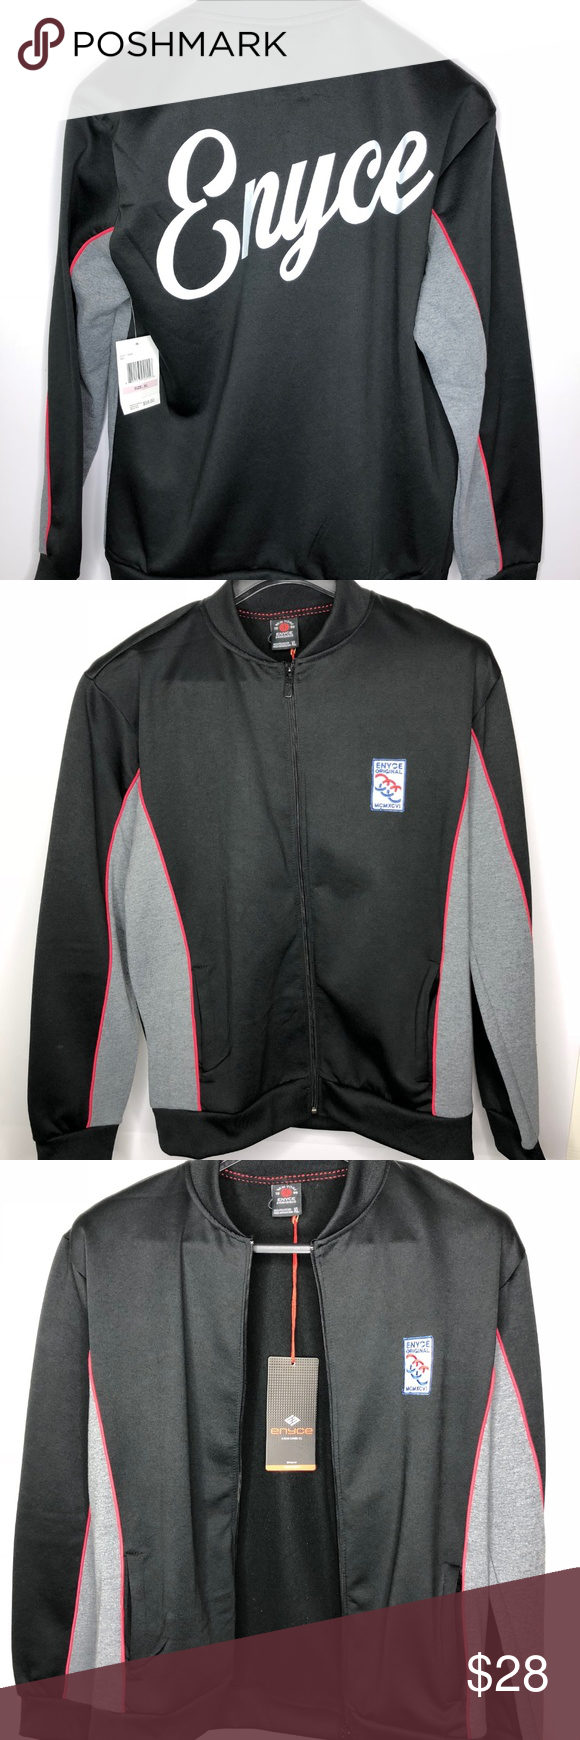 Enyce menus track vintage jacket fleece black nwt vintage jacket